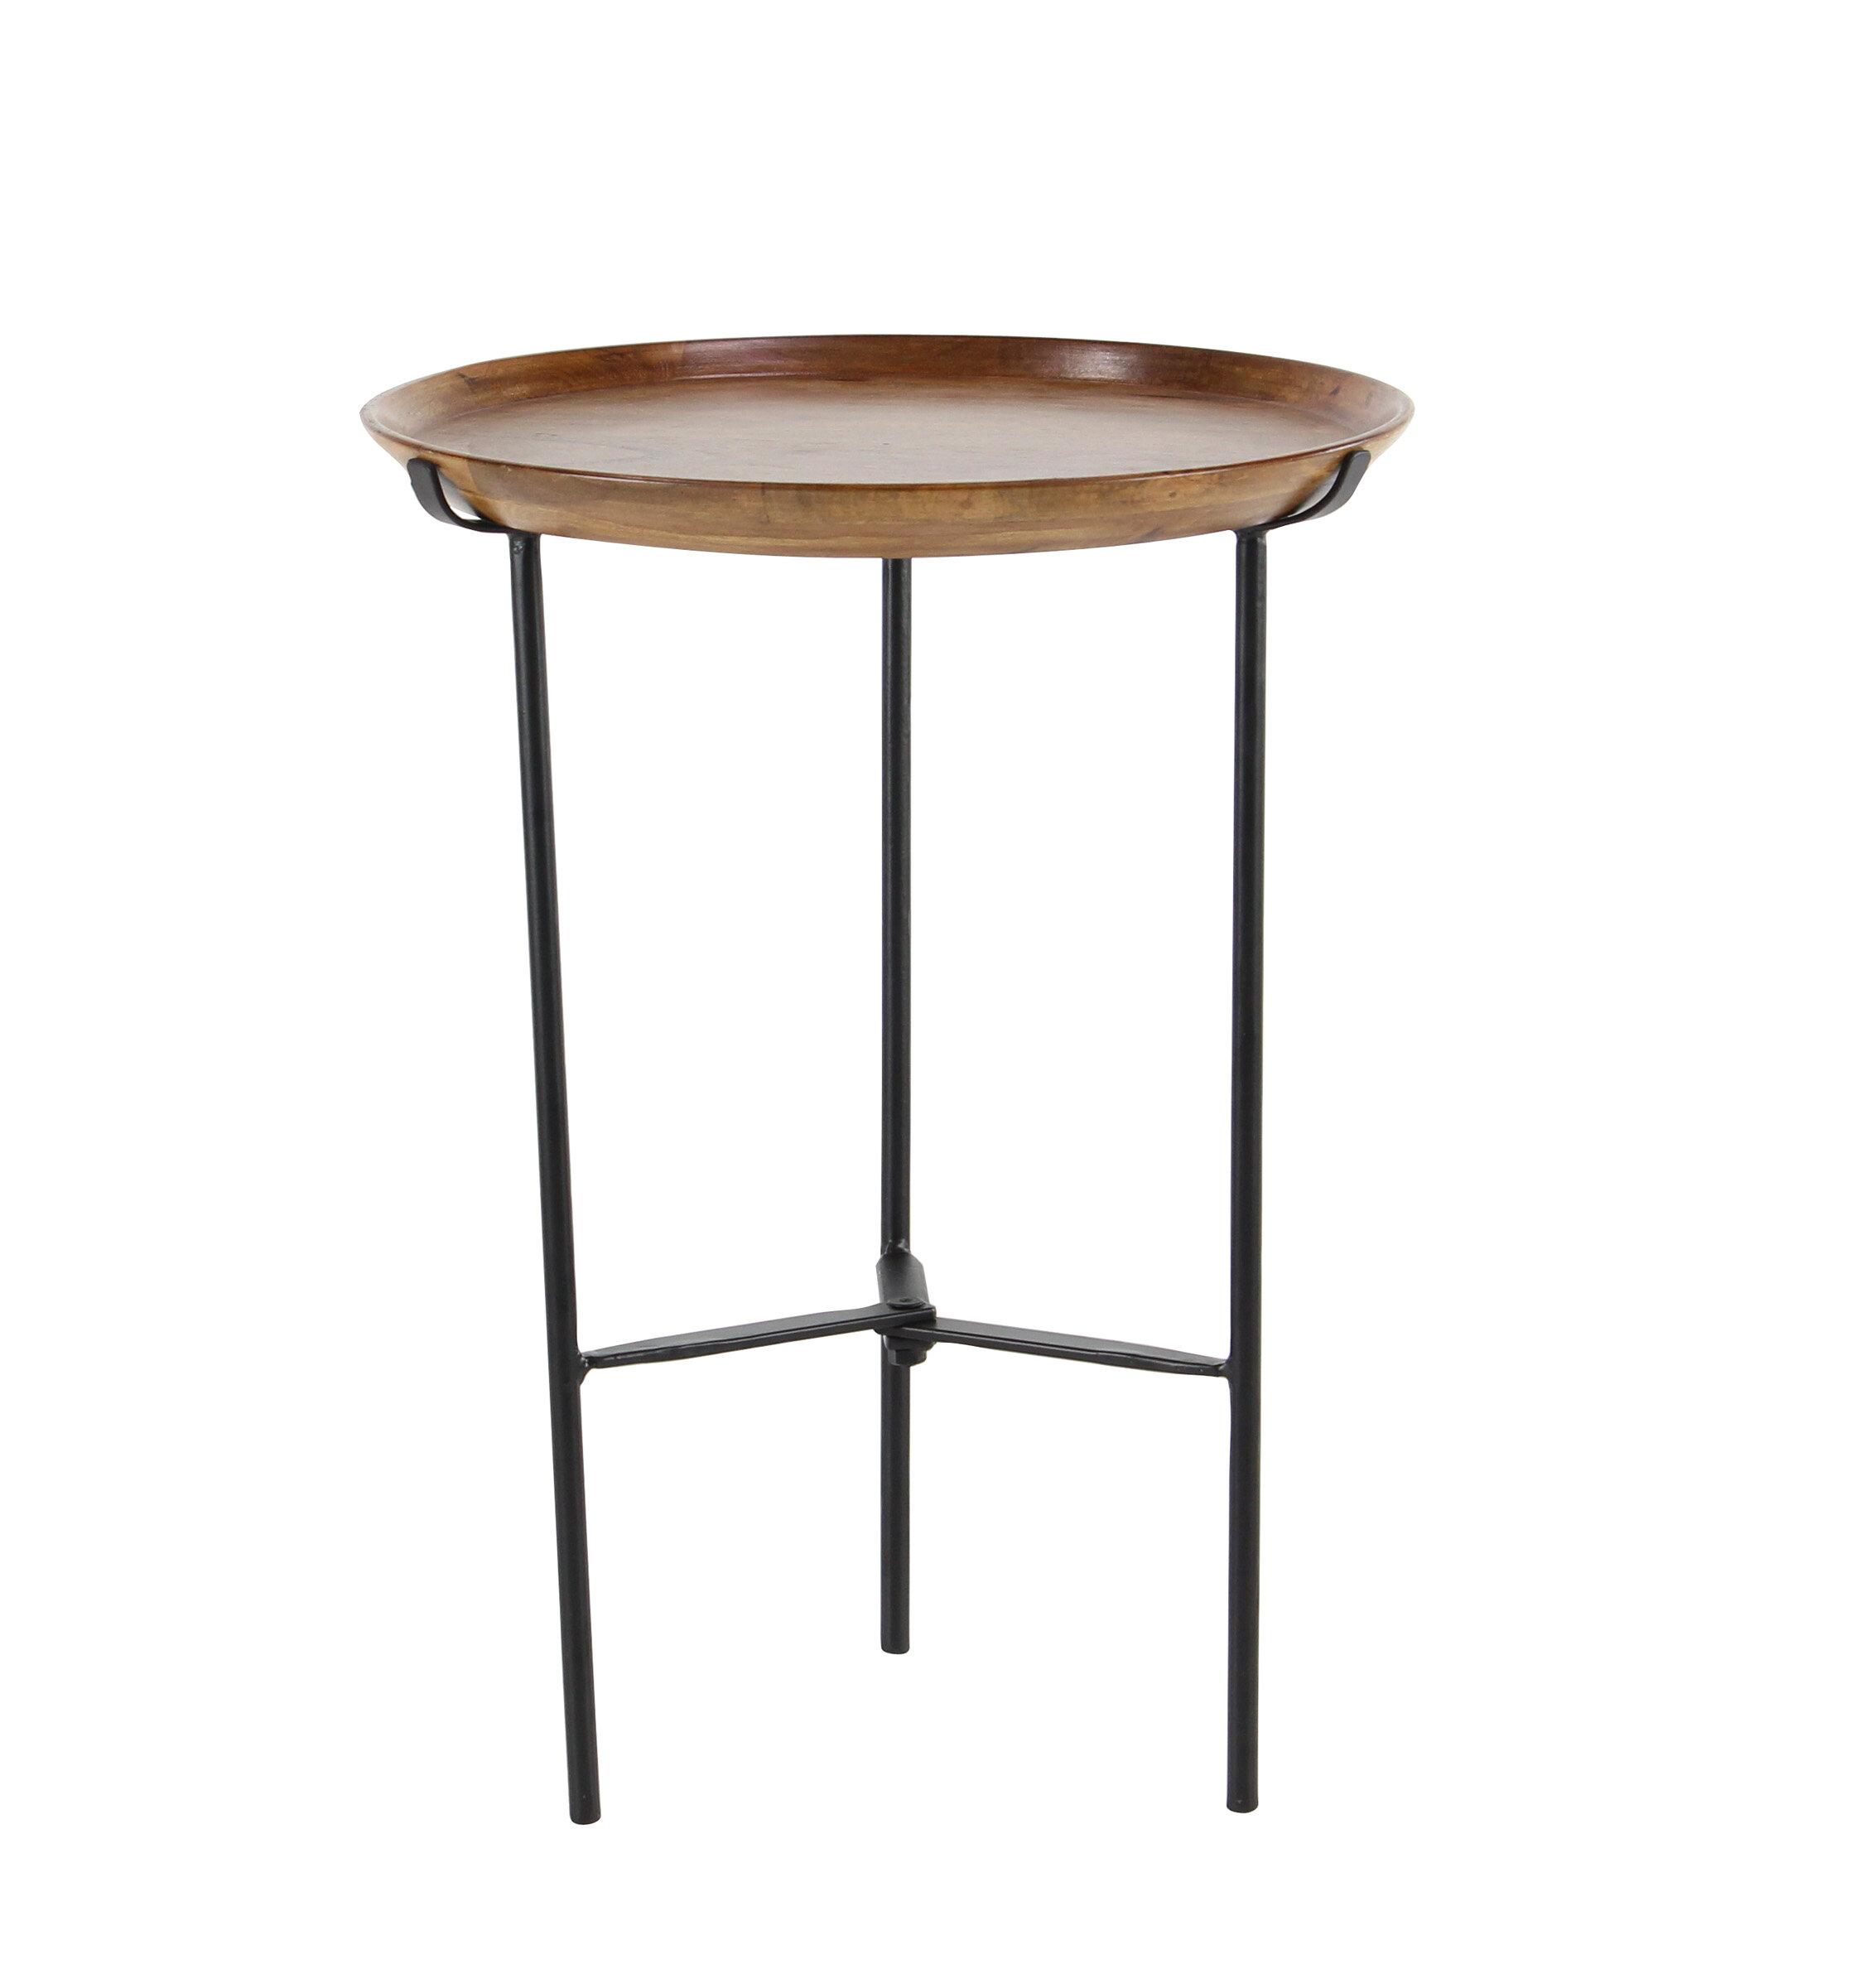 rustic round end table. Rustic Round End Table